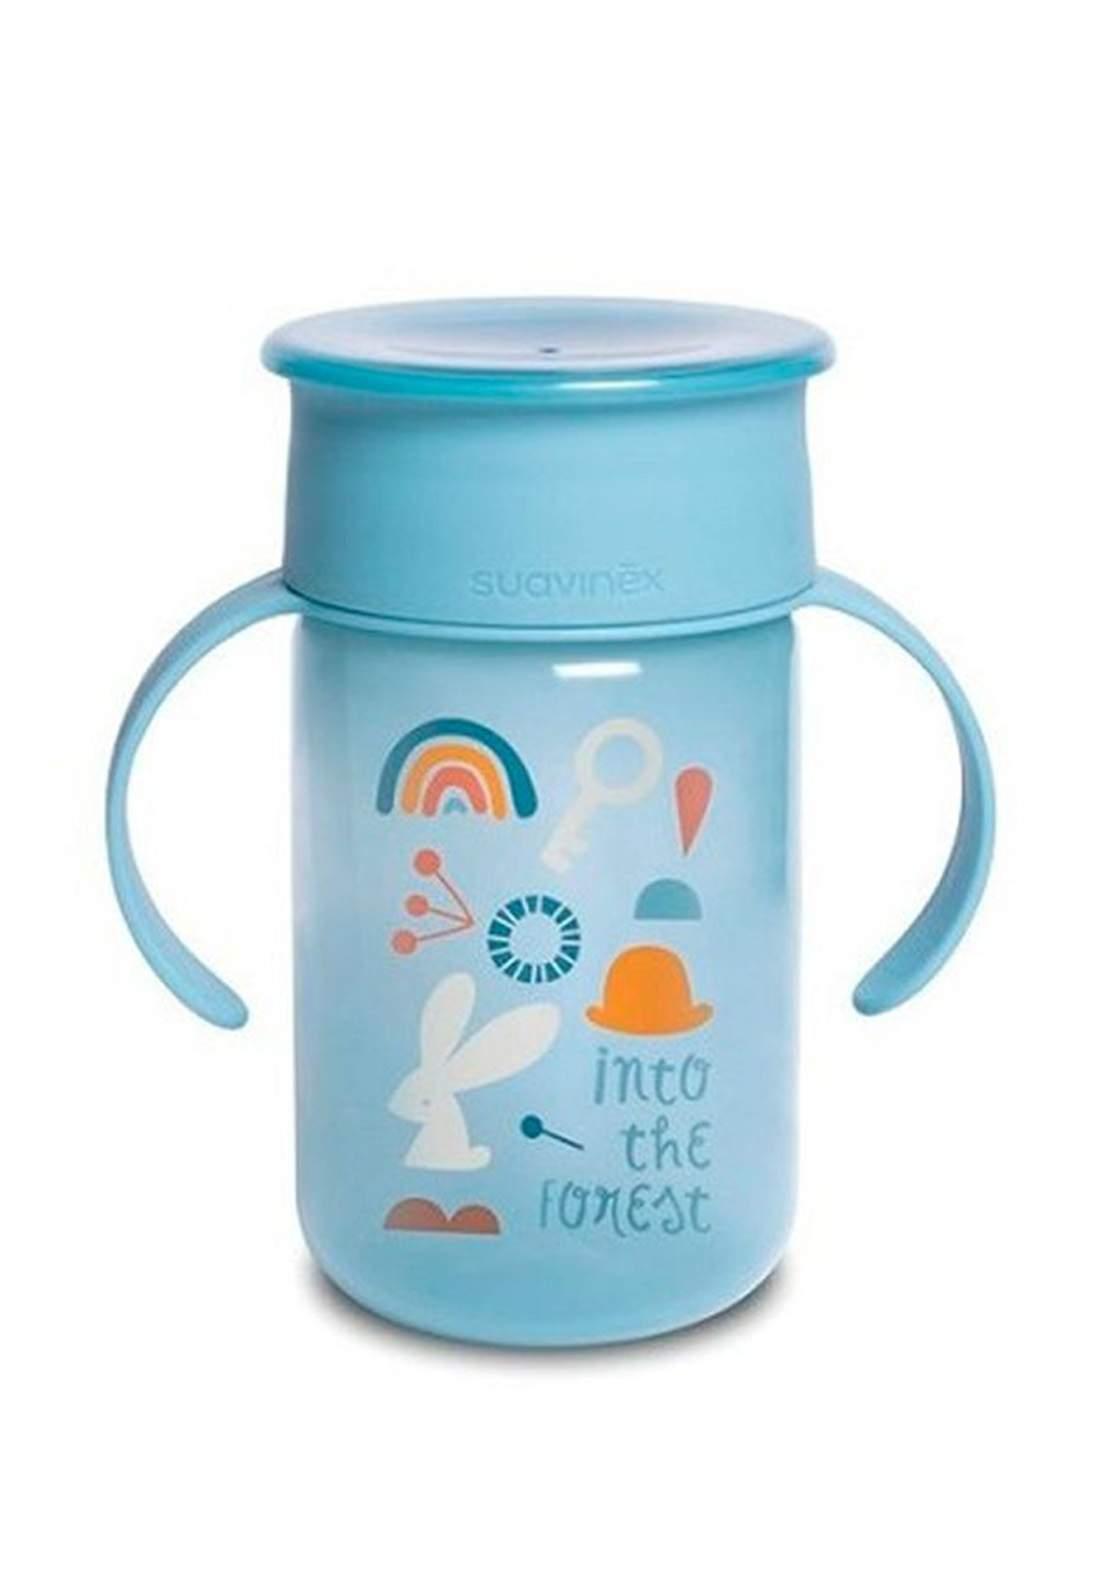 Suavinex Trainer Cup 360 ml قدح للاطفال